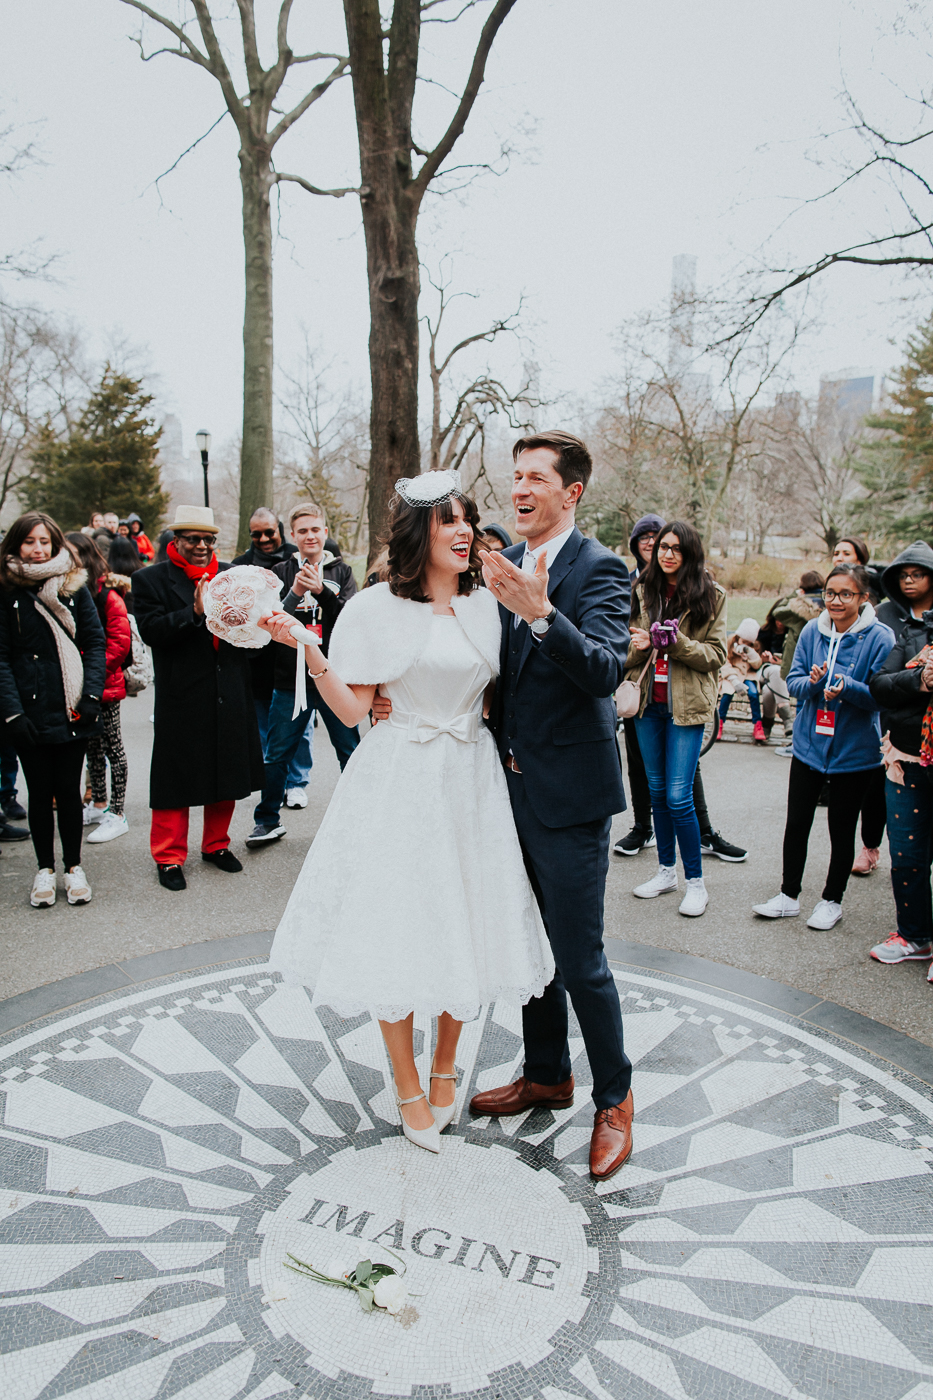 Ladies-Pavilion-Central-Park-NYC-Documentary-Elopement-Wedding-Photographer-44.jpg